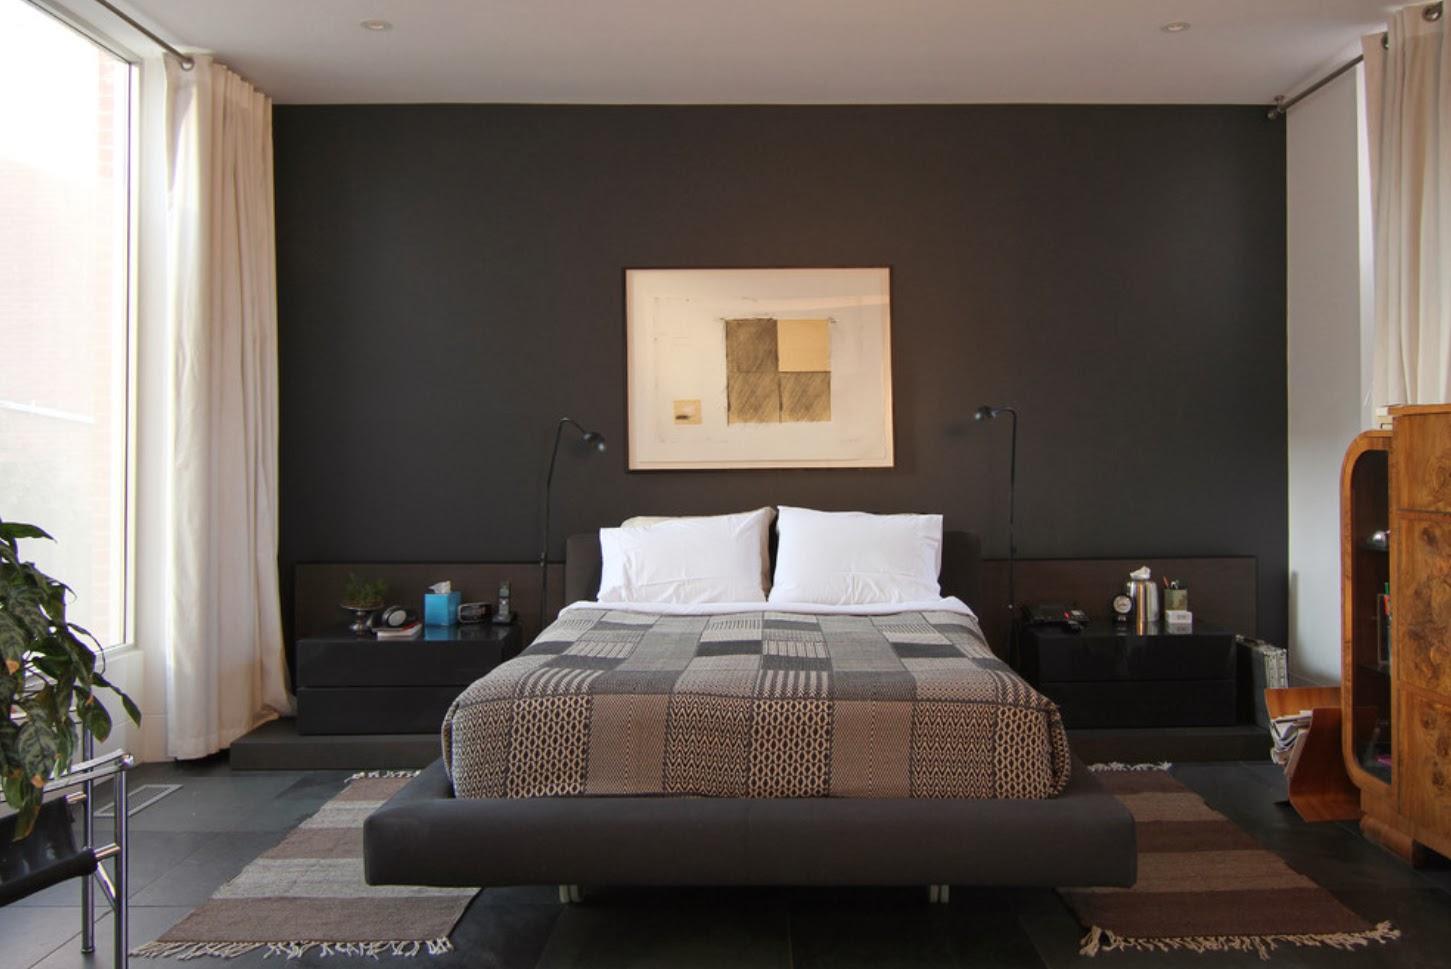 Black Furniture: Interior Design Photo Ideas - Small Design Ideas